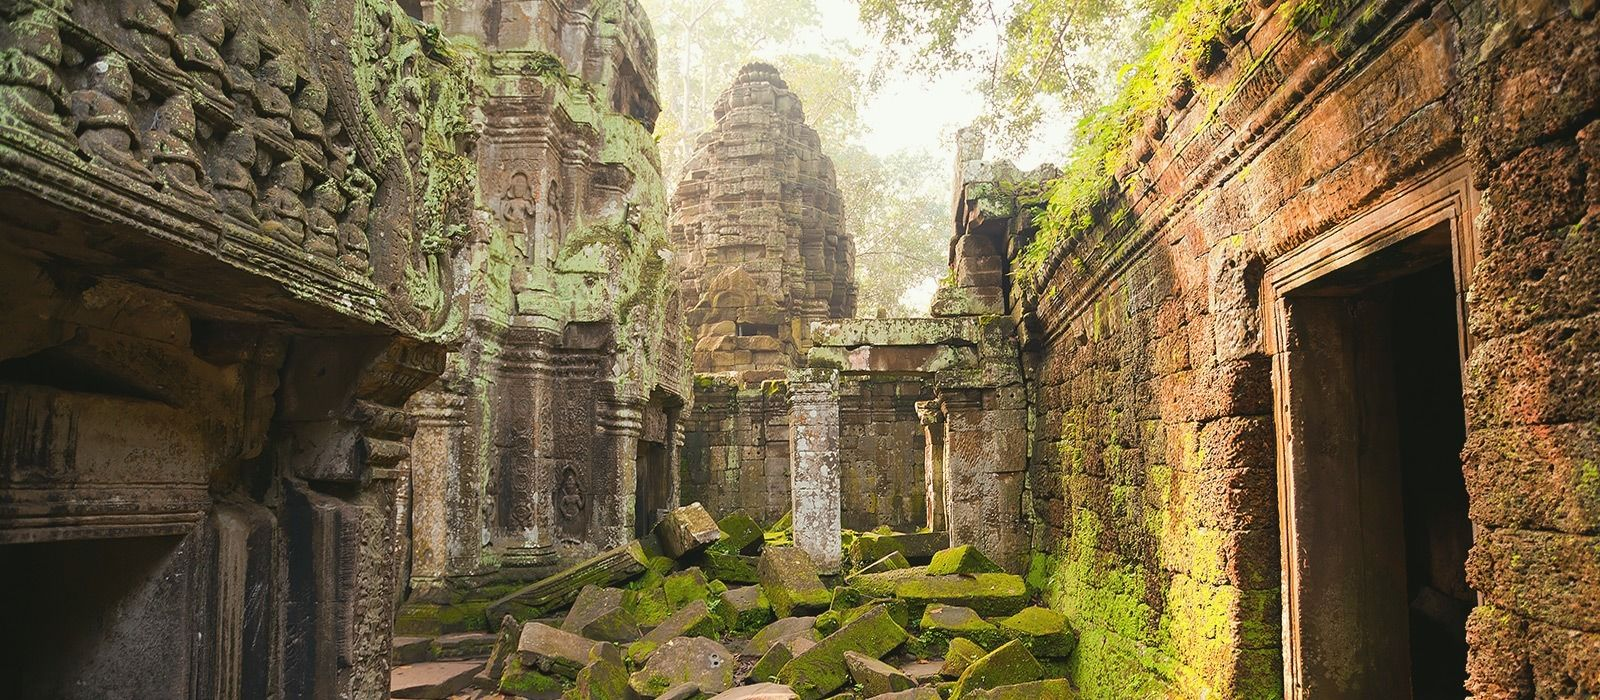 A Grand Journey through South East Asia Tour Trip 7